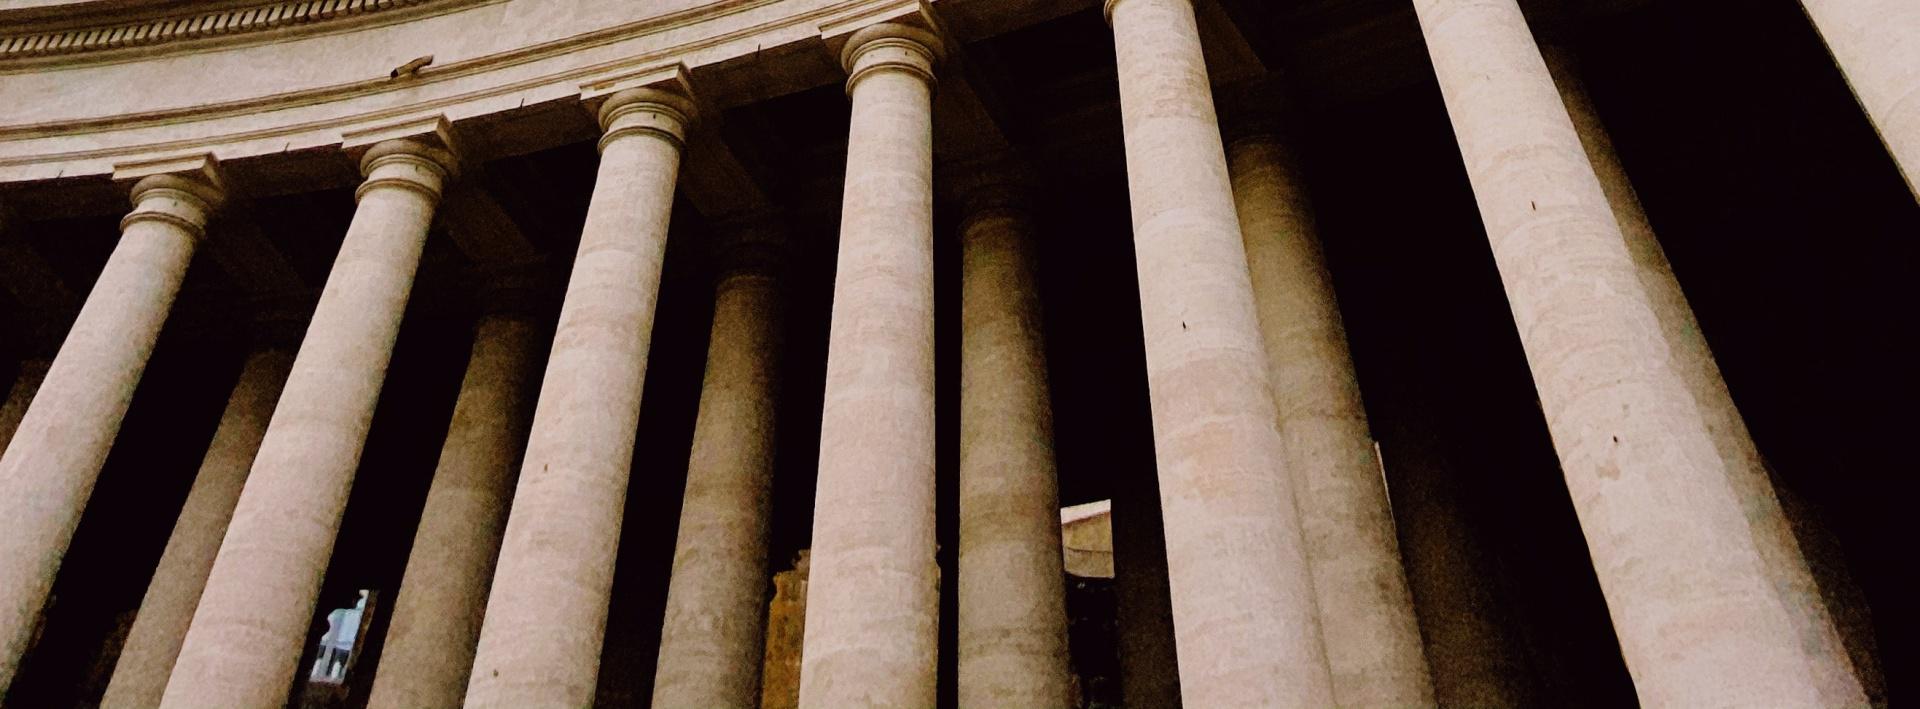 Our Pillars